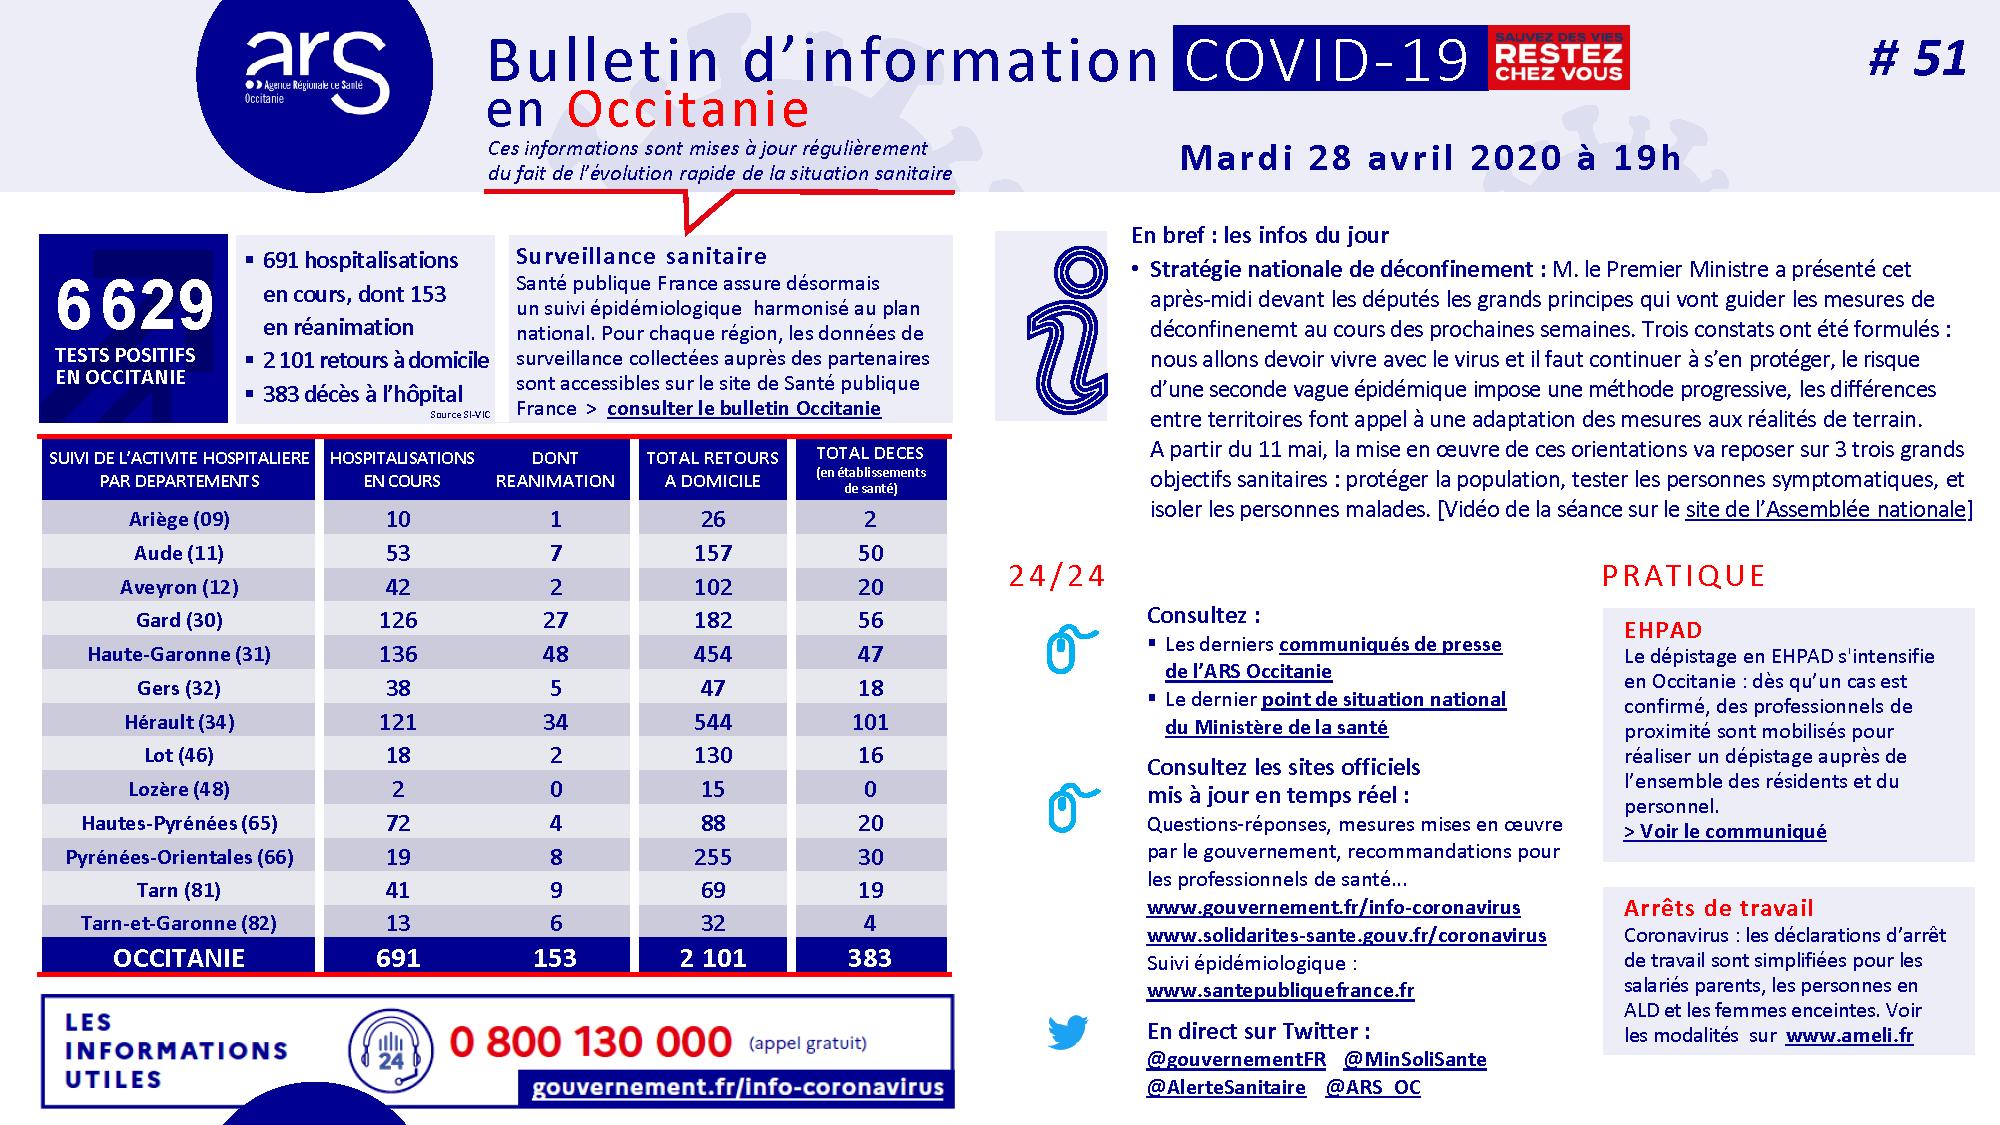 Coronavirus. Bulletin d'information en Occitanie #51 28/04/2020